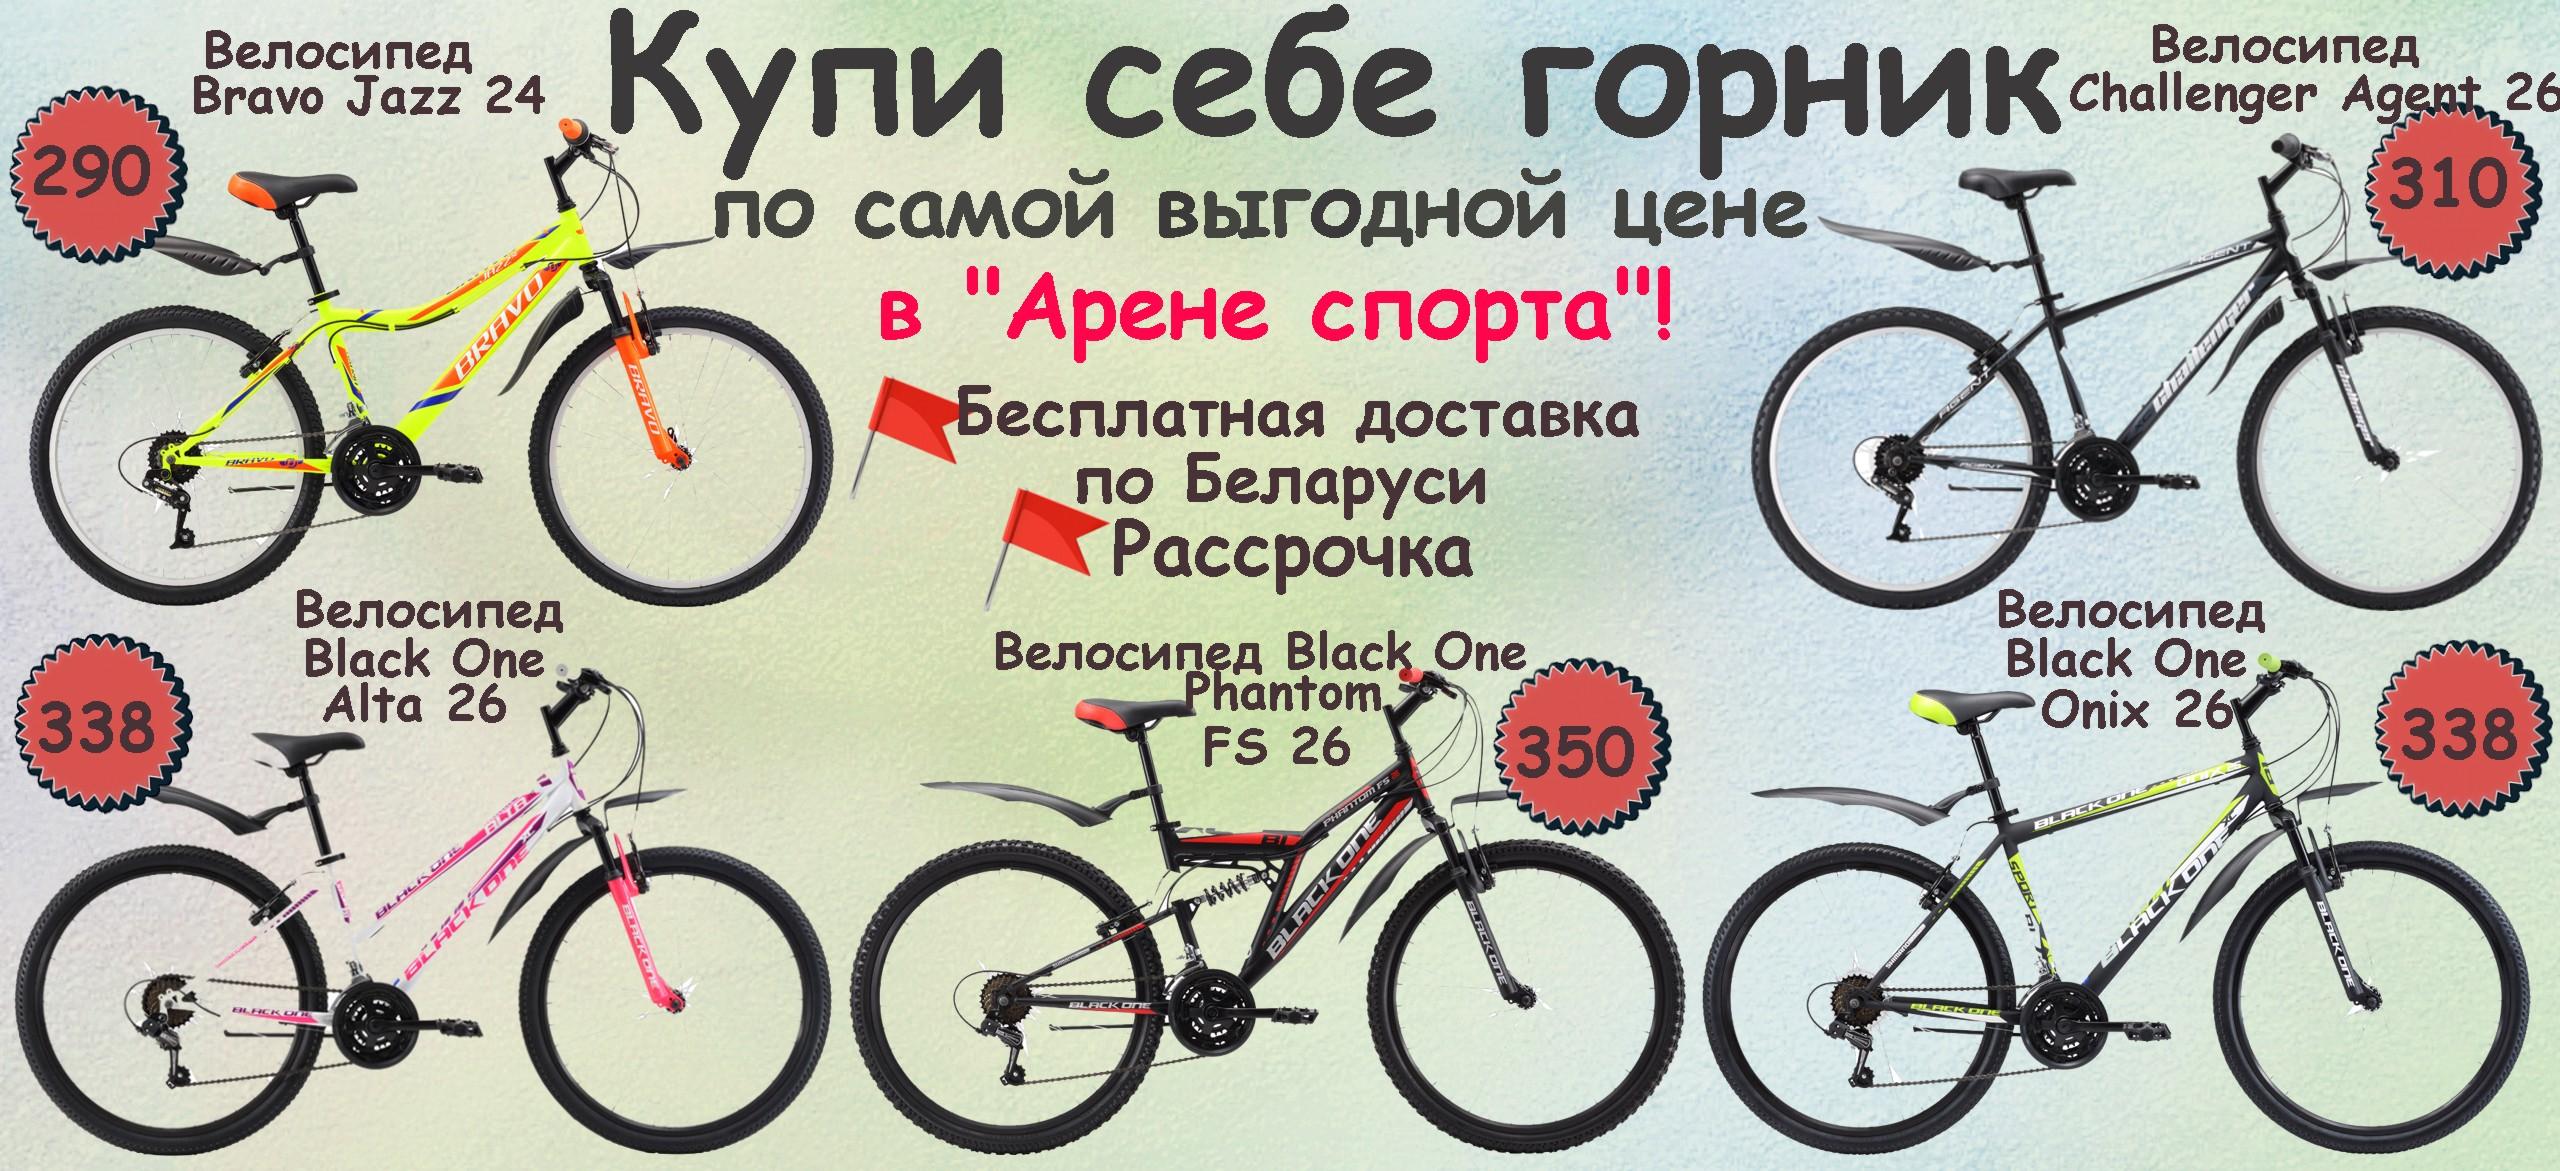 http://arena-sporta.by/catalog/velosipedy